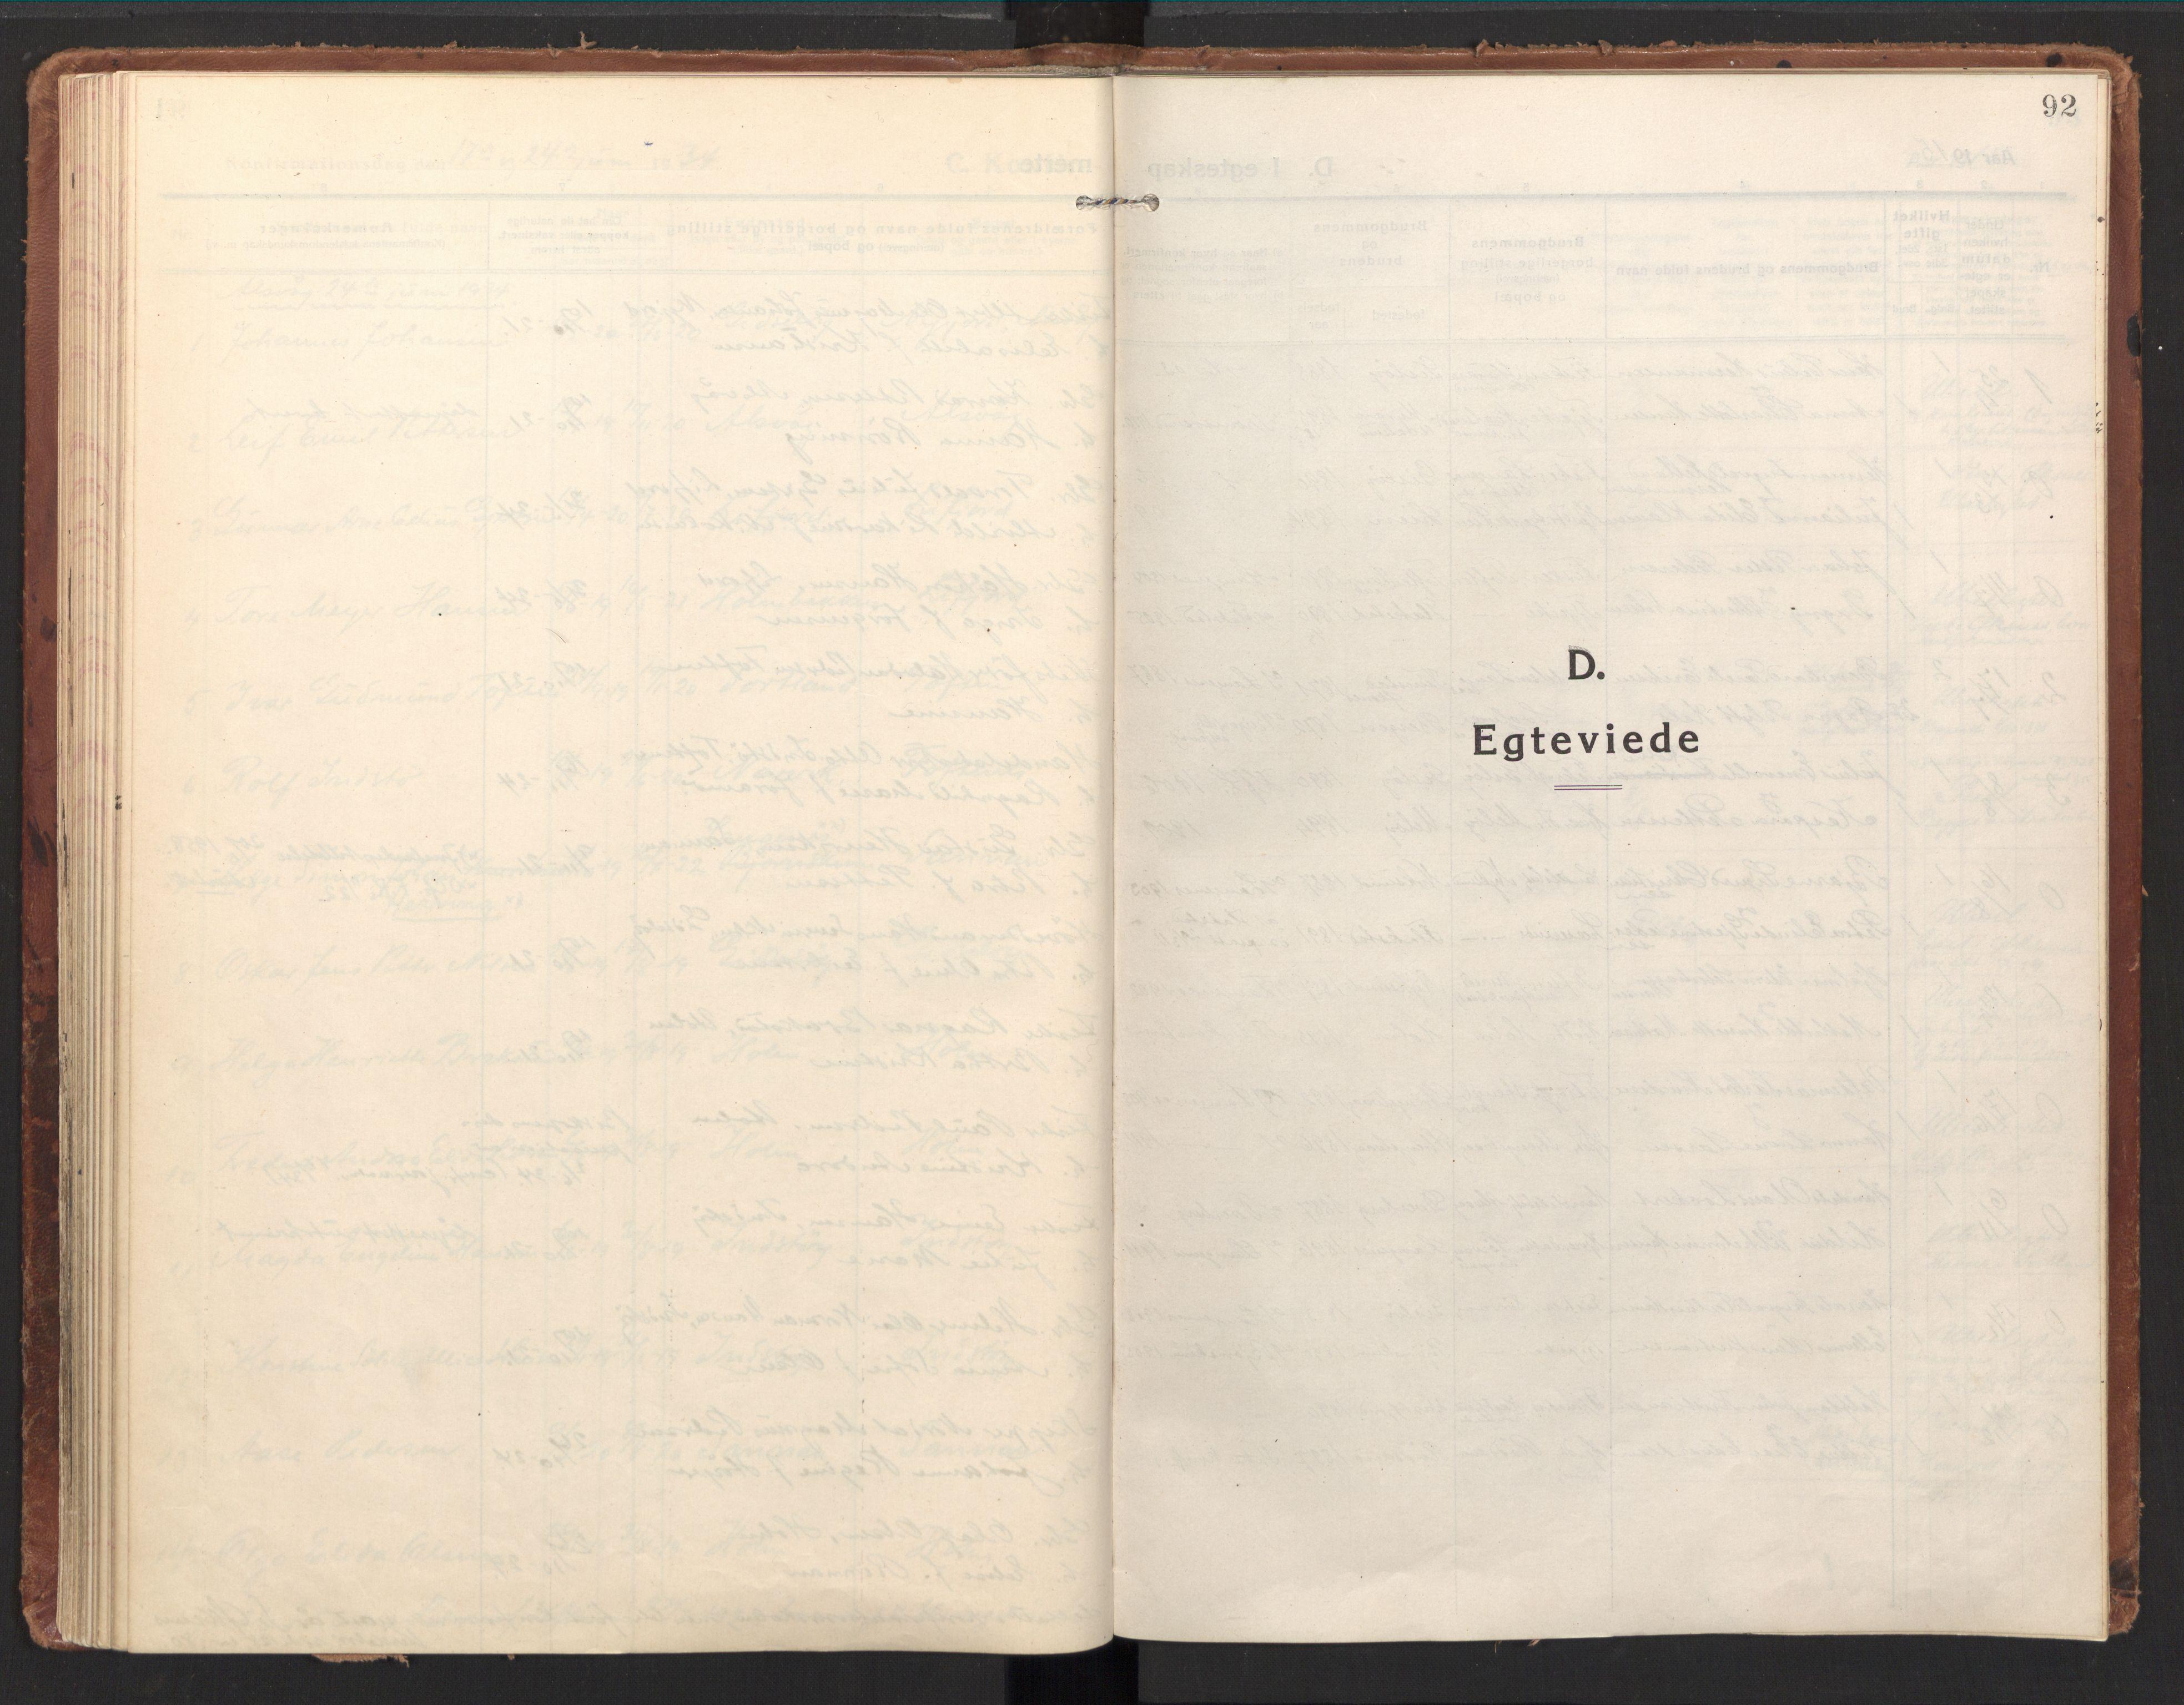 SAT, Ministerialprotokoller, klokkerbøker og fødselsregistre - Nordland, 894/L1357: Ministerialbok nr. 894A03, 1913-1934, s. 92